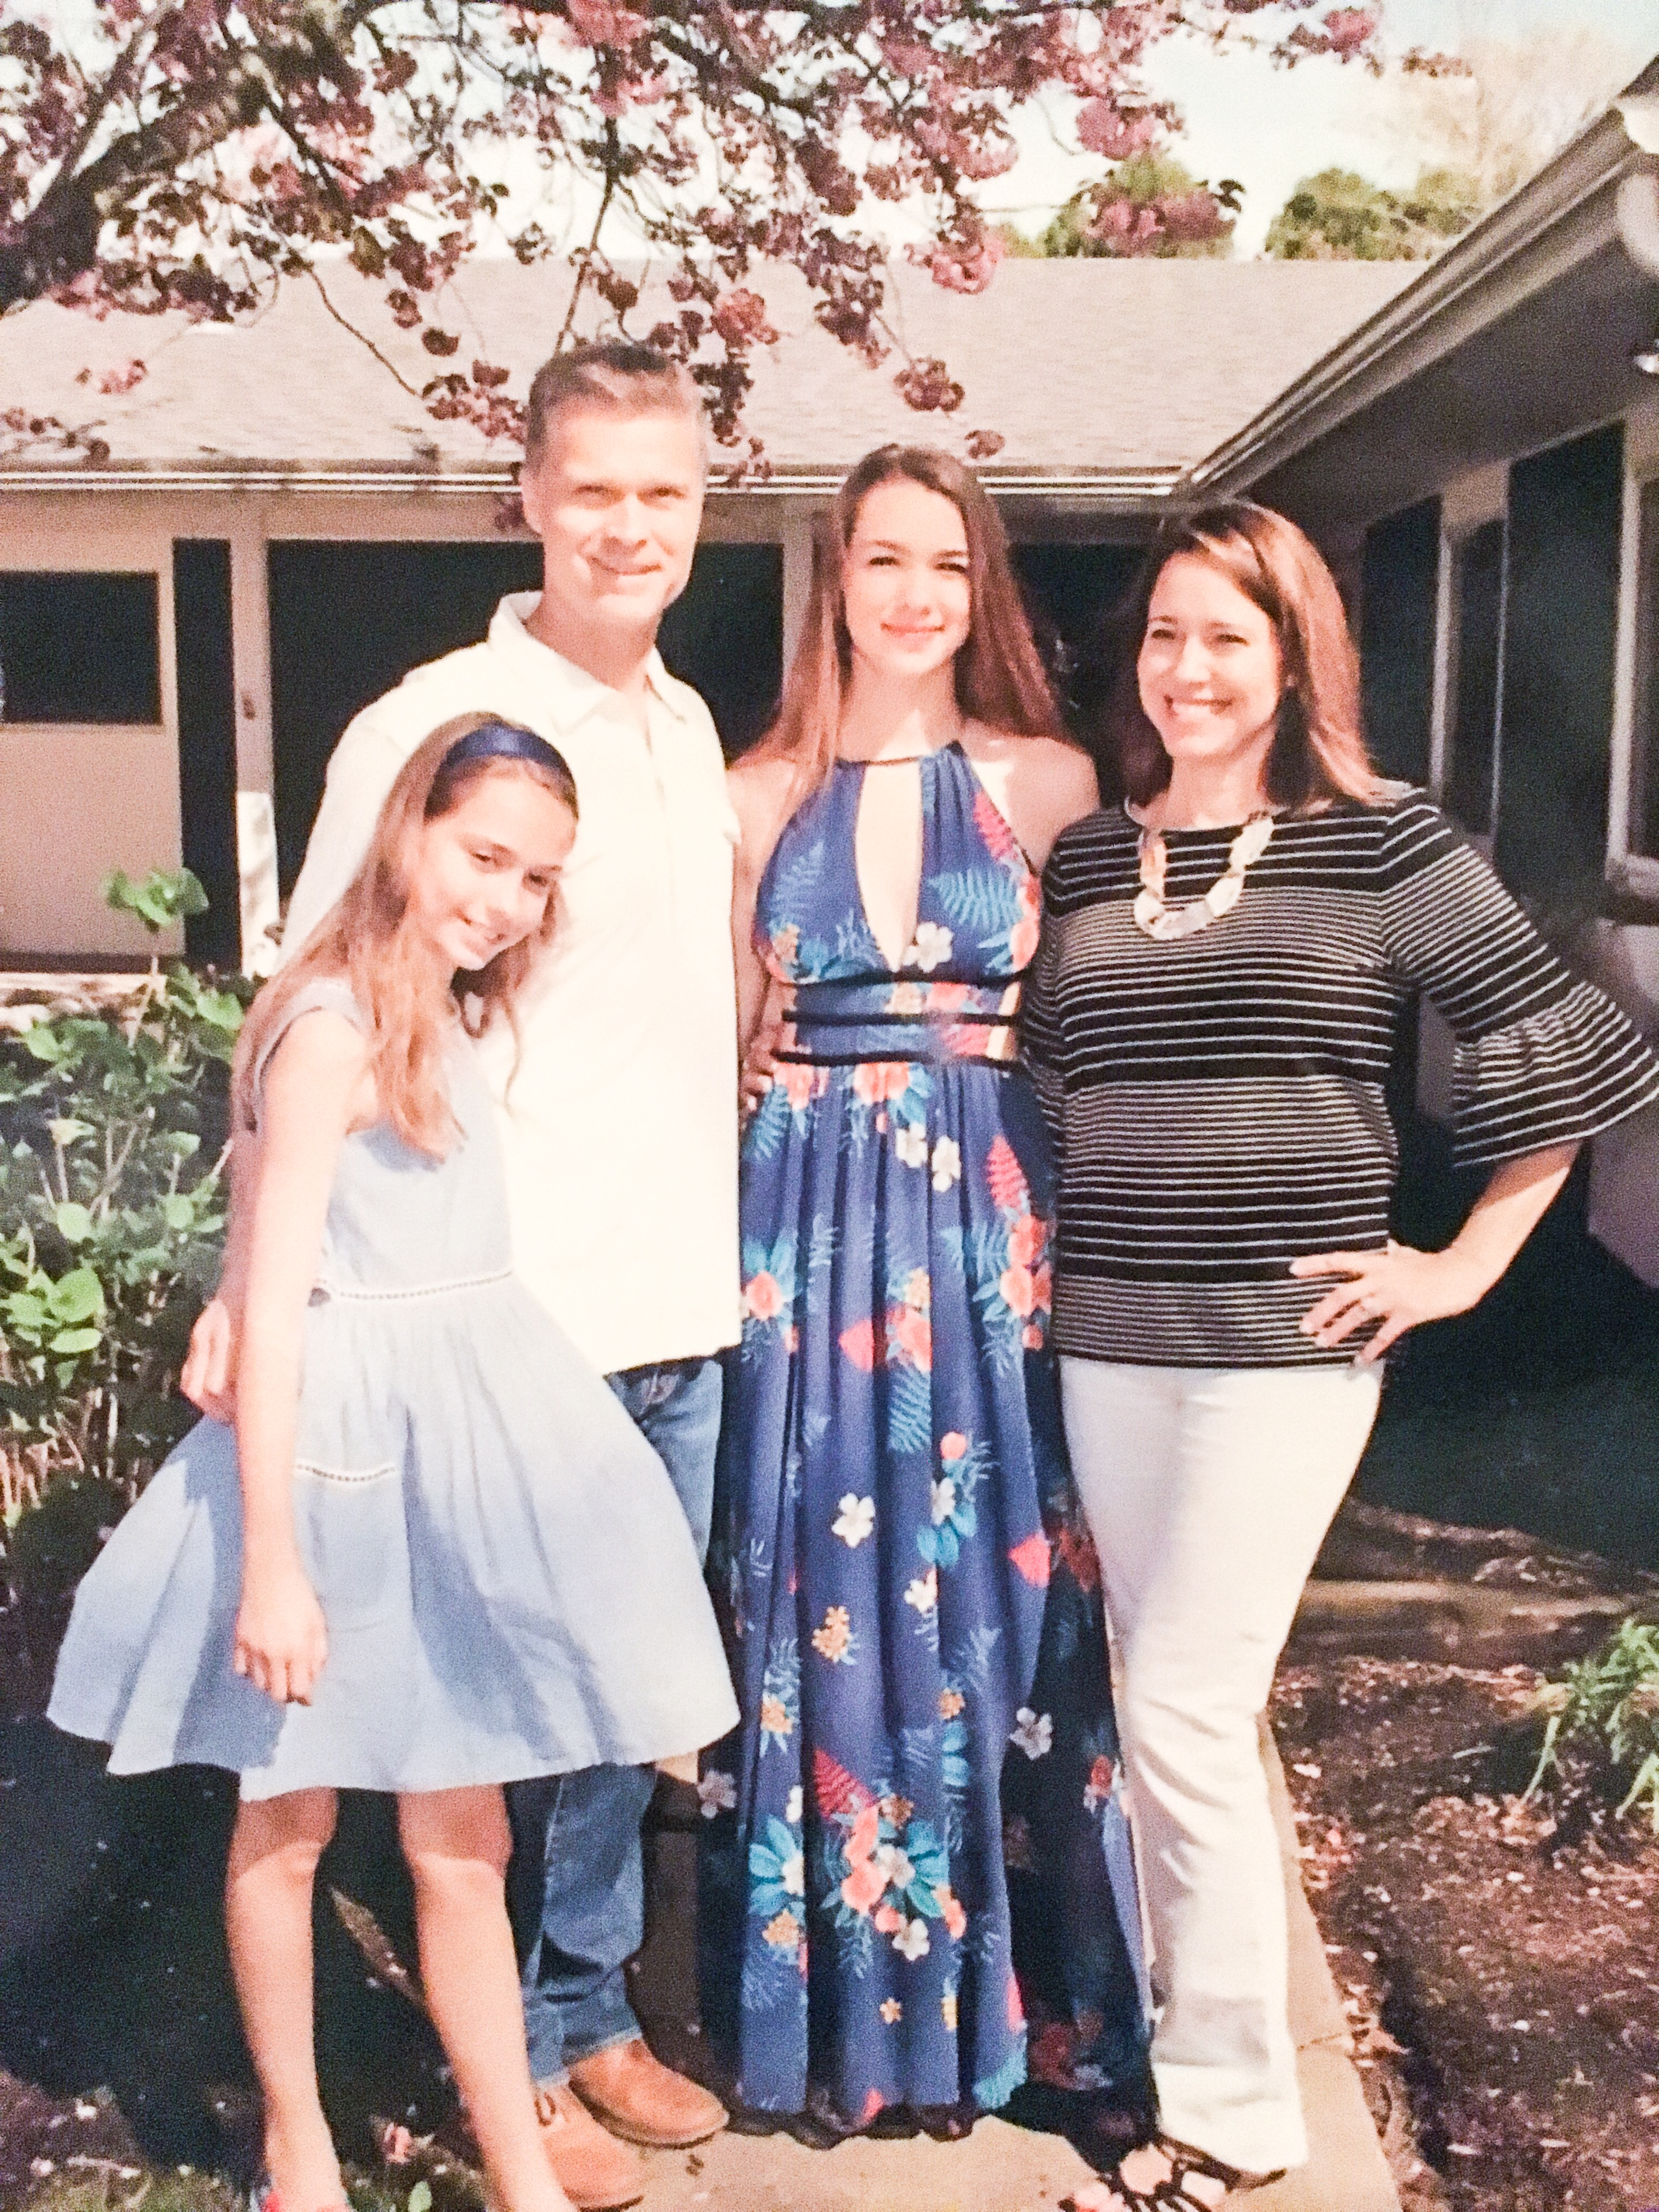 JoAnne Mantz's family: Elizabeth, Captain (retired) Peter Mantz, Malia and JoAnne. Photo courtesy of JoAnne Mantz.